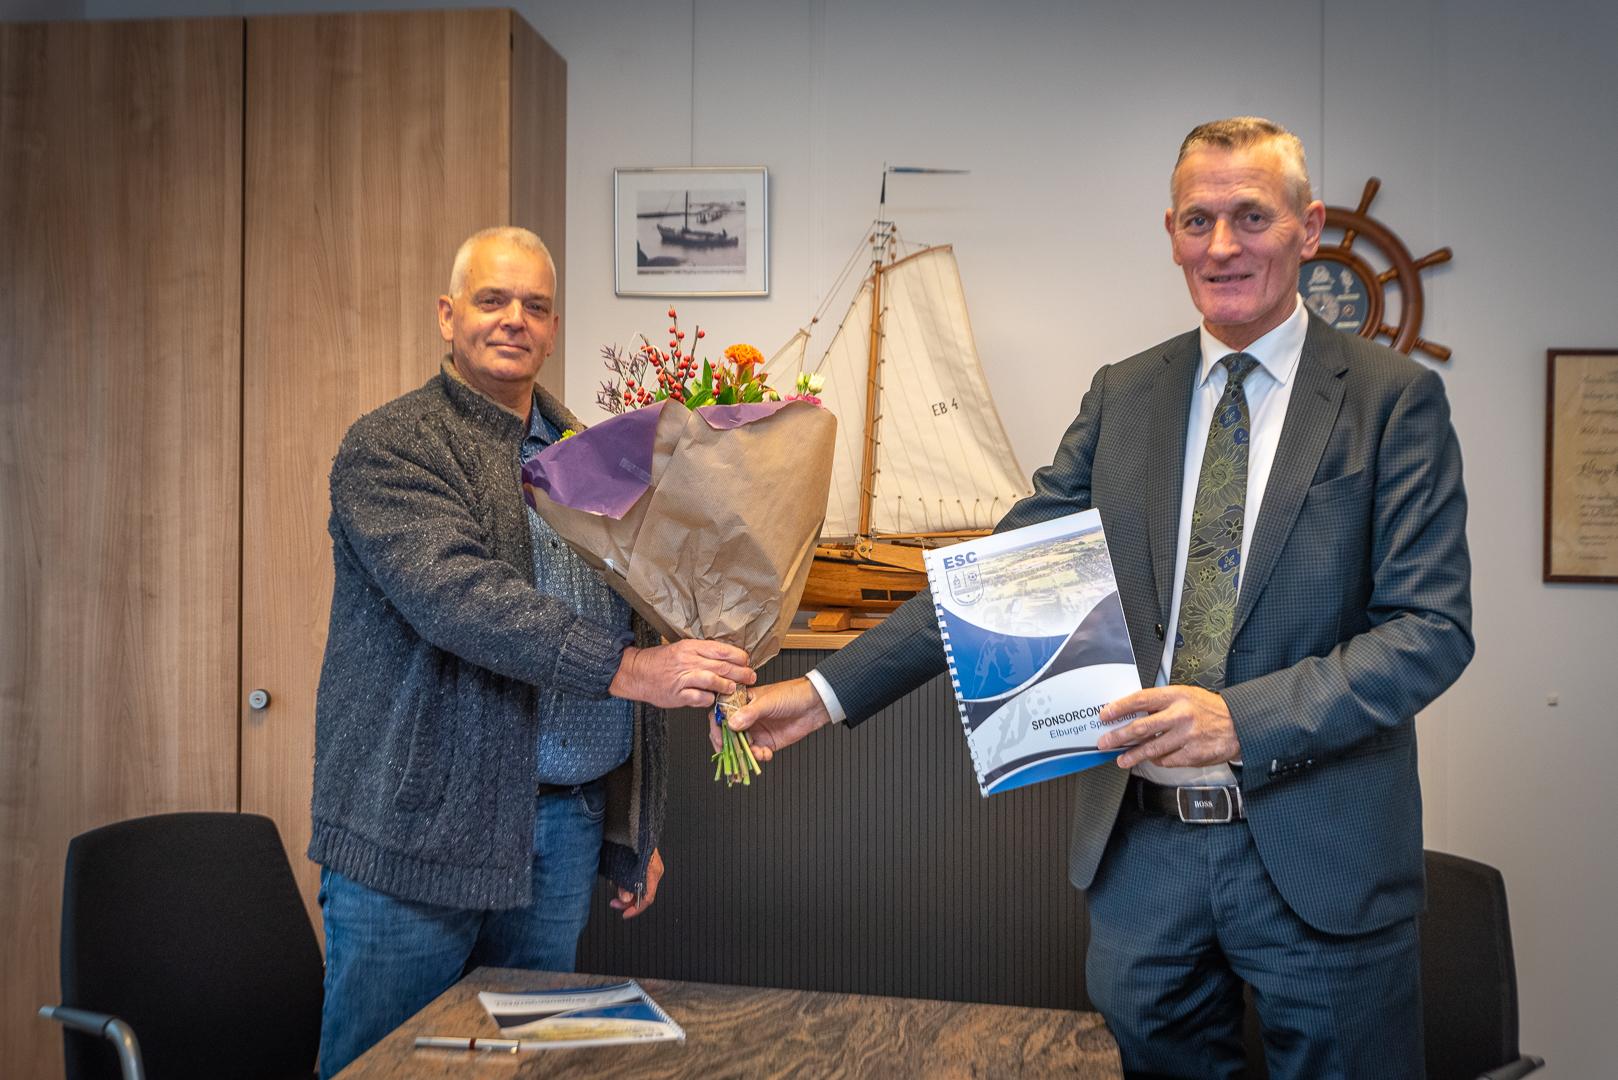 KGS Diamond Nederland verlengt als subsponsor - Elburger SC